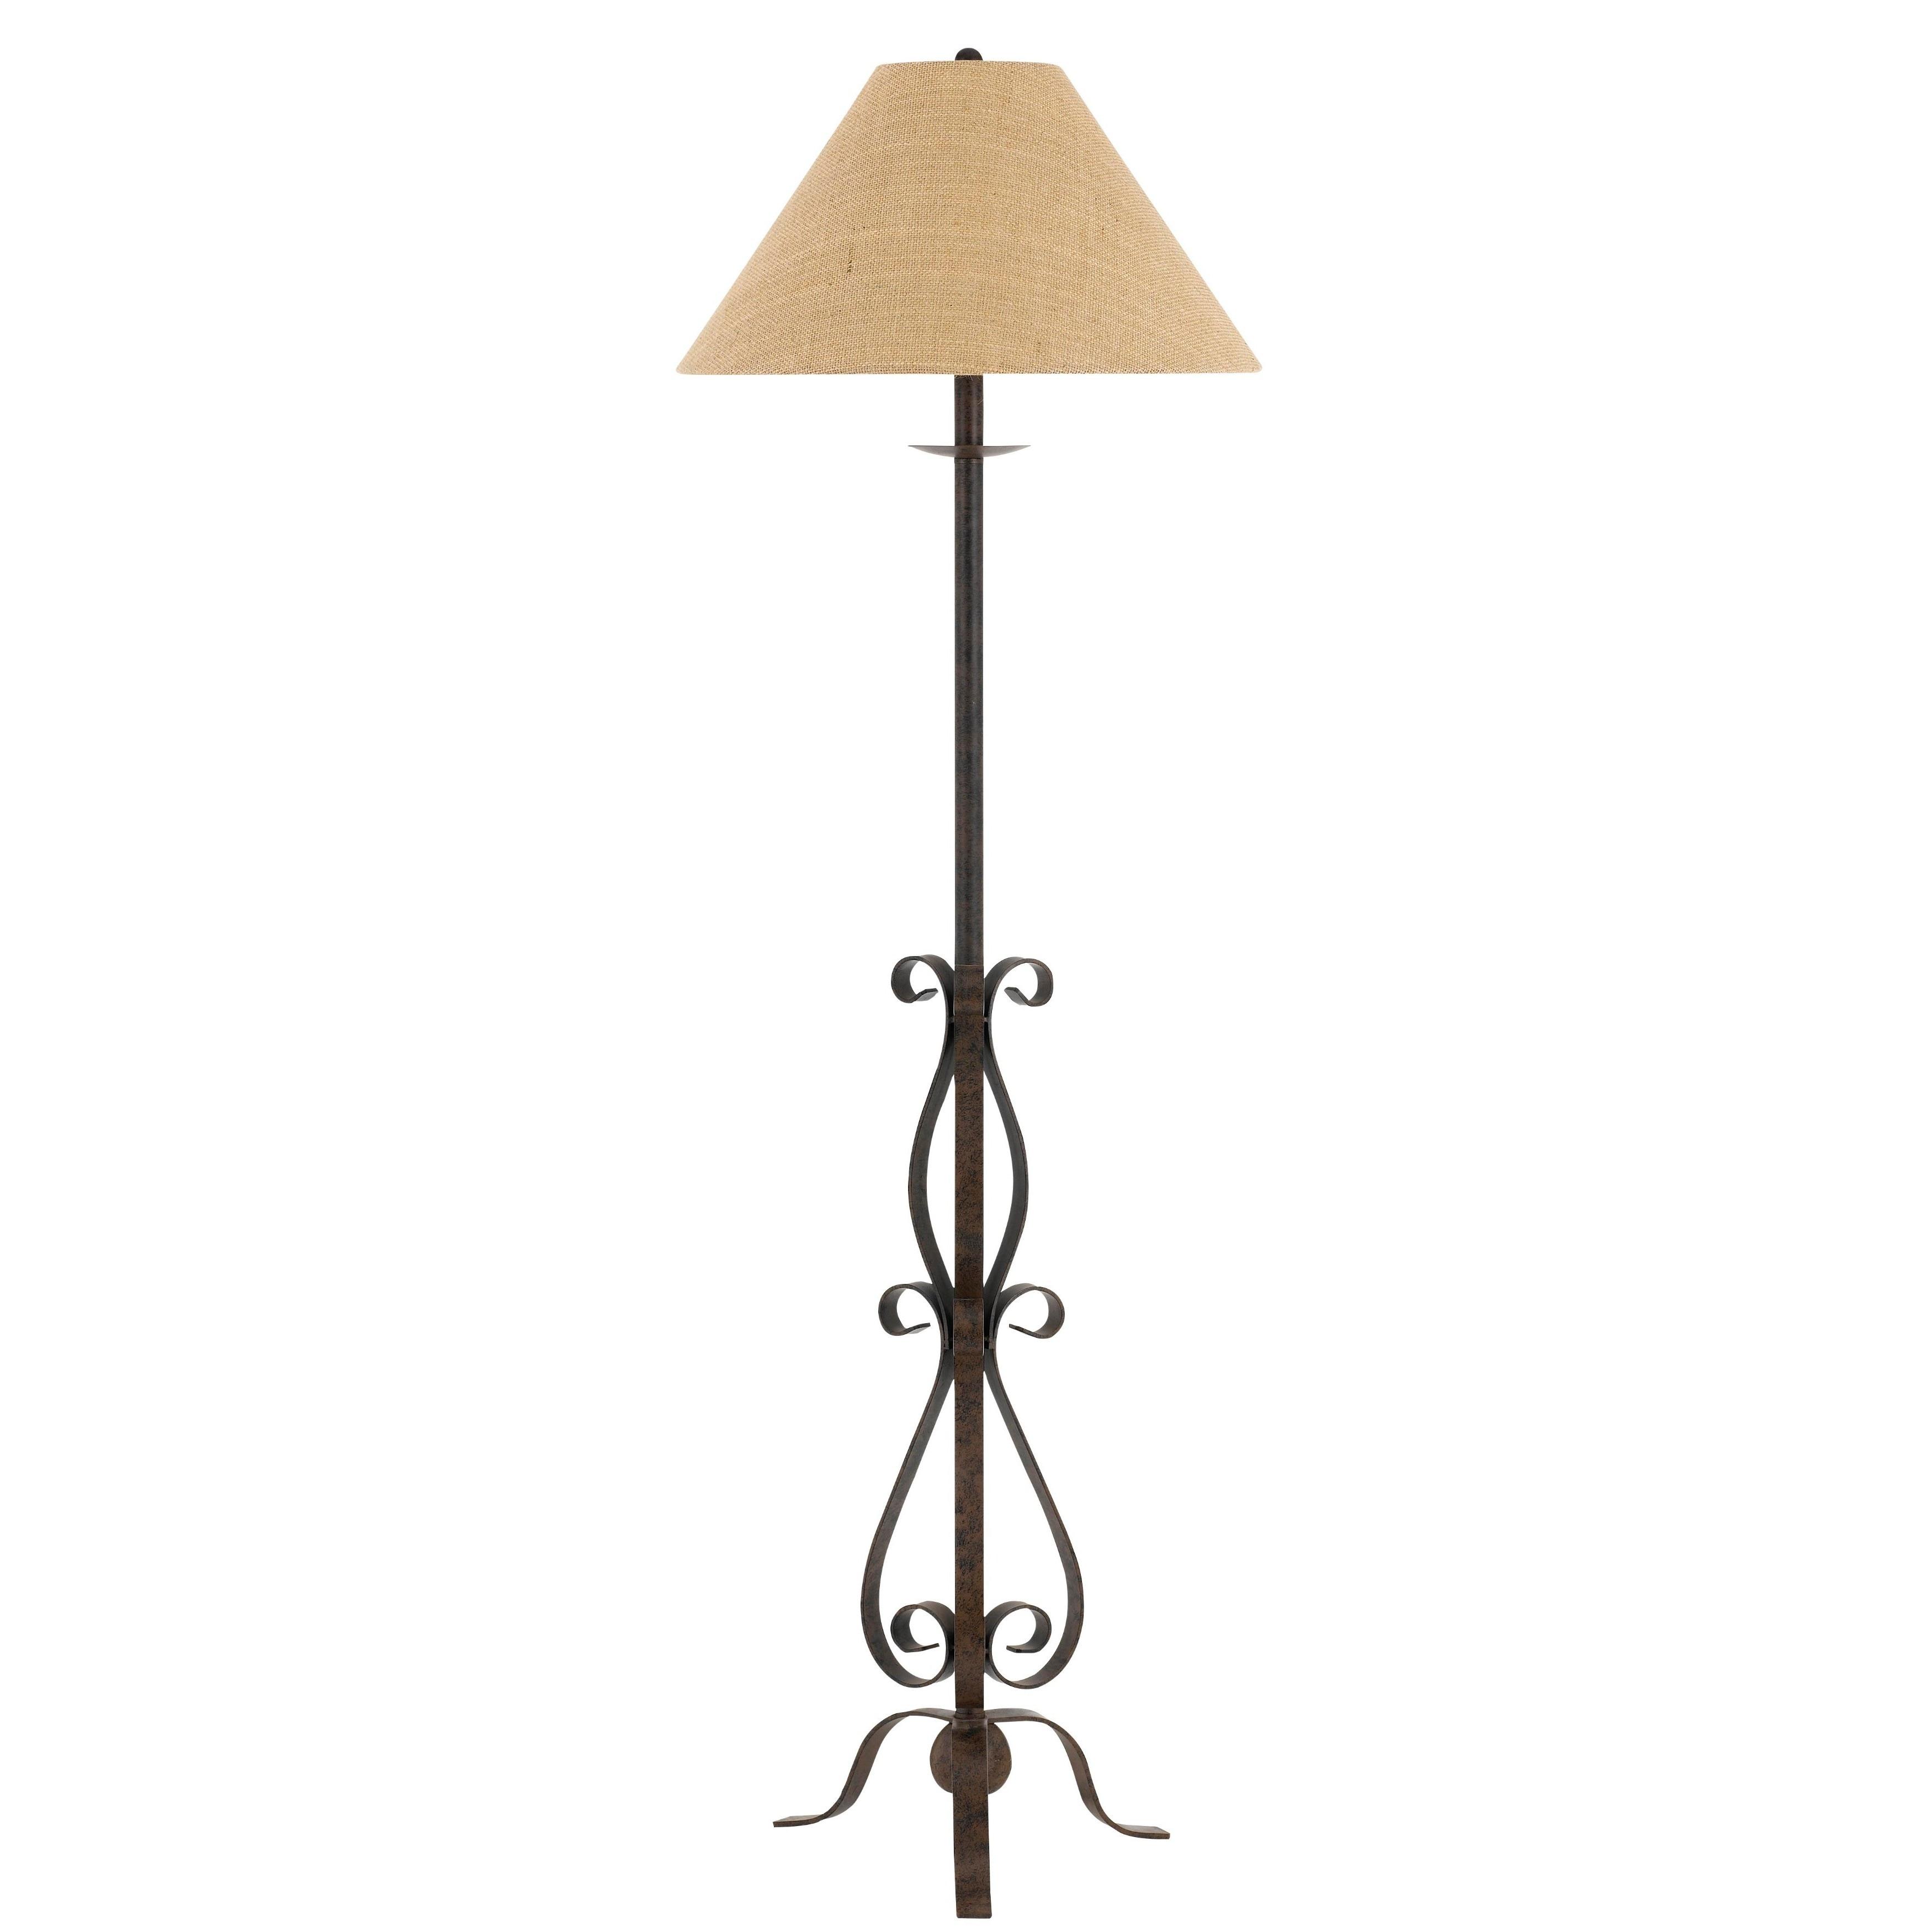 hot sale online 70302 6a8ad Ekalaka Tan Wrought Iron Floor Lamp with Burlap Shade